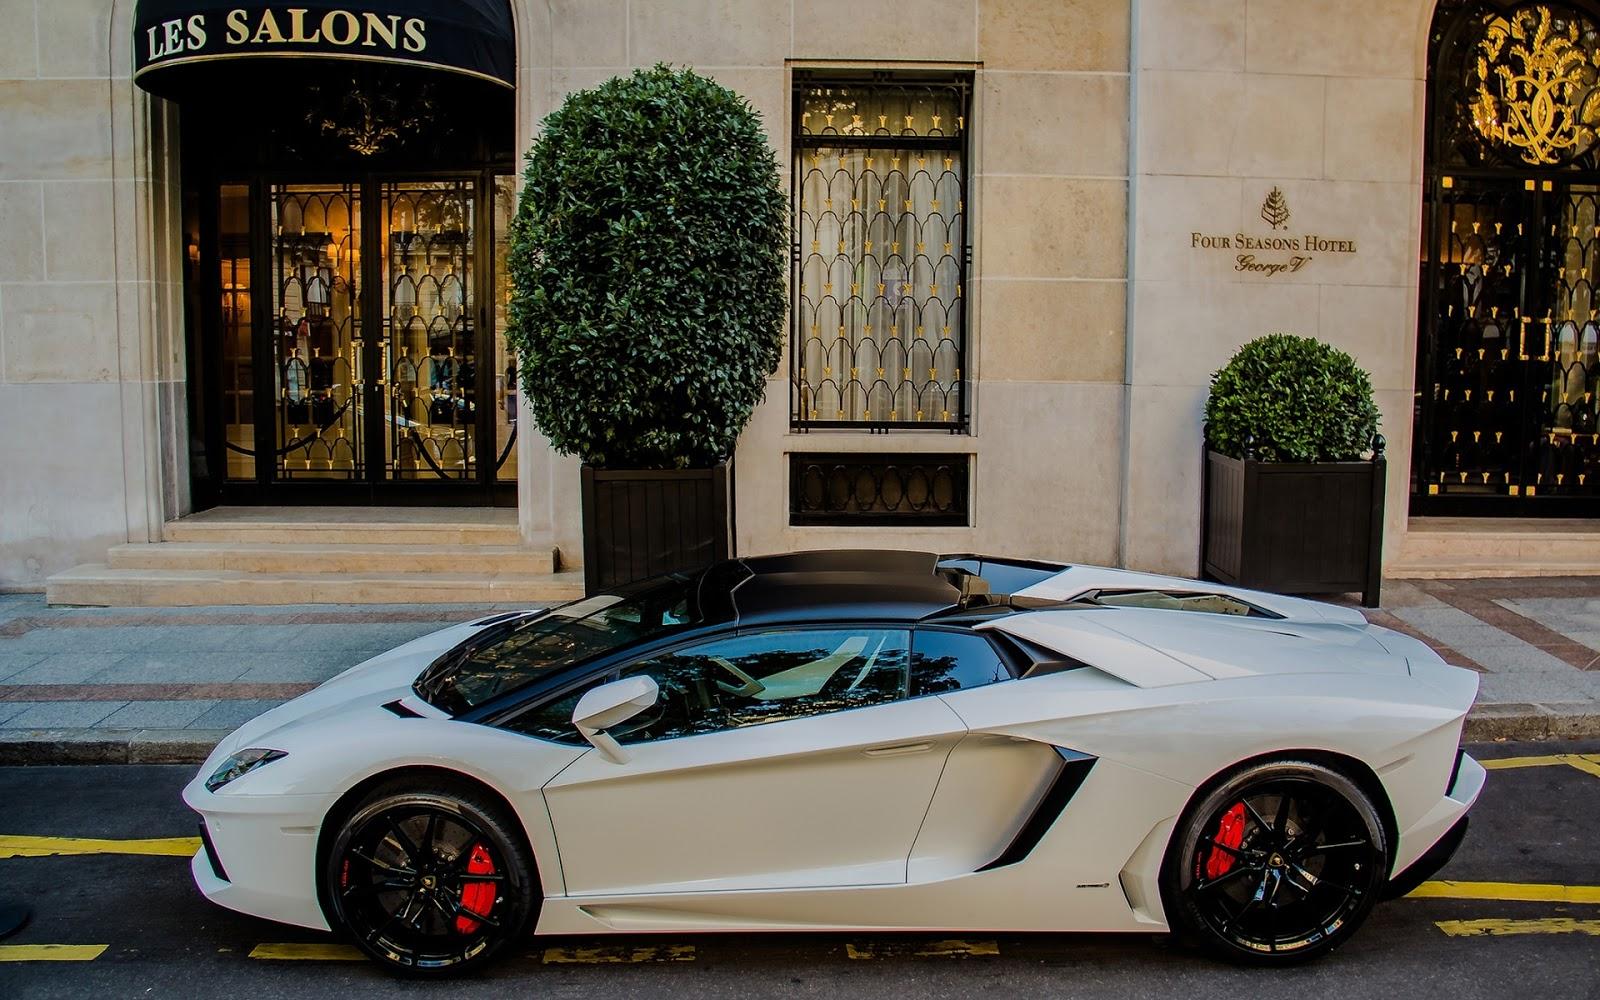 White Lamborghini Aventador Autos Y Motos Fascinantes Pinterest